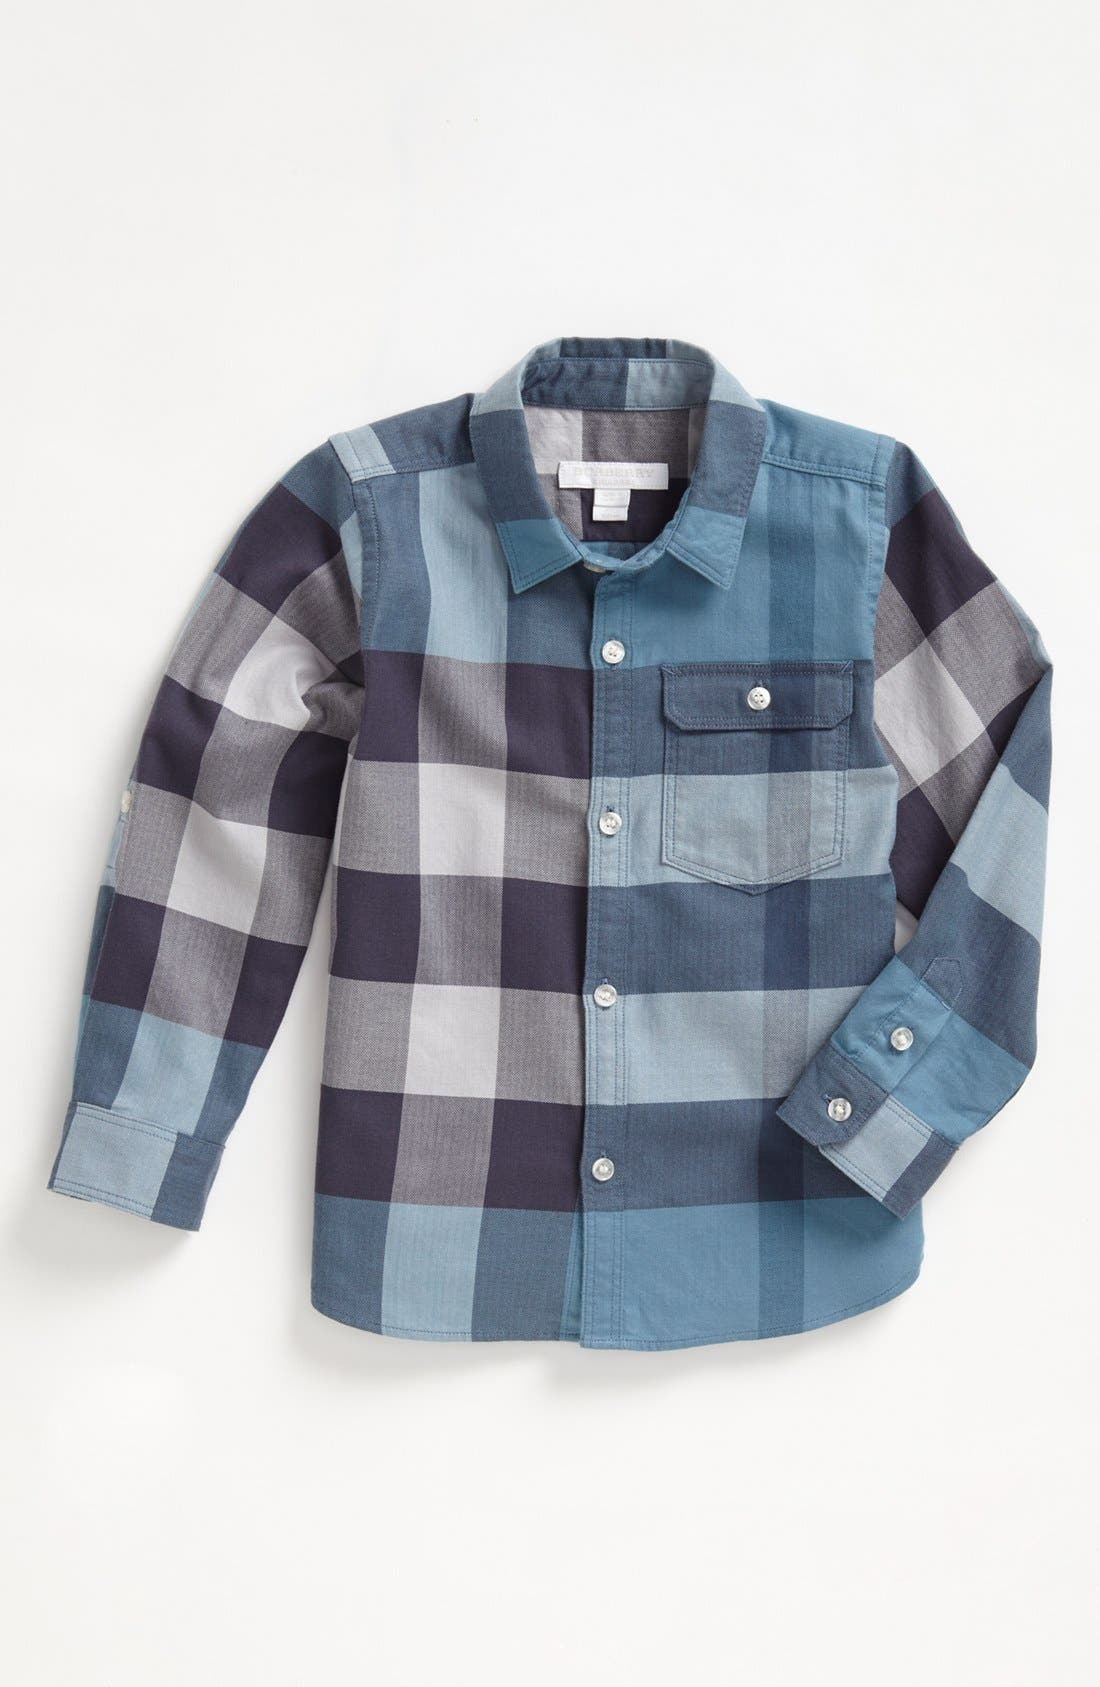 Alternate Image 1 Selected - Burberry 'Mini Hadley' Sport Shirt (Little Boys & Big Boys)